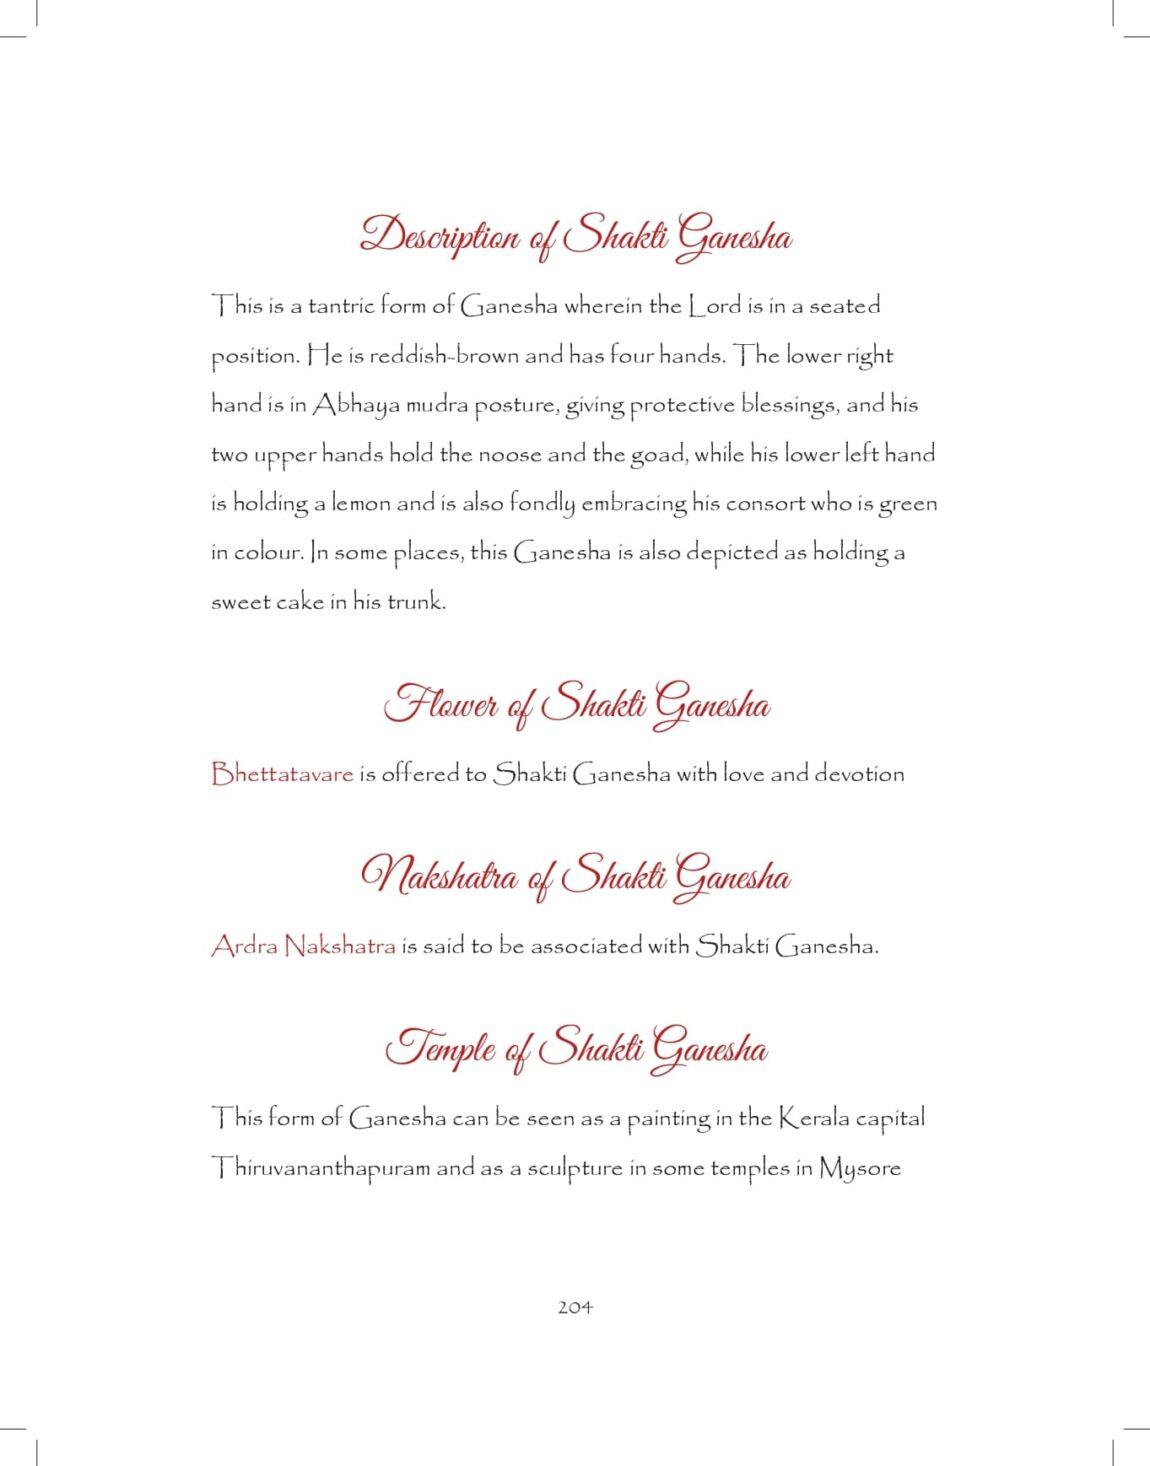 Ganesh-print_pages-to-jpg-0204.jpg